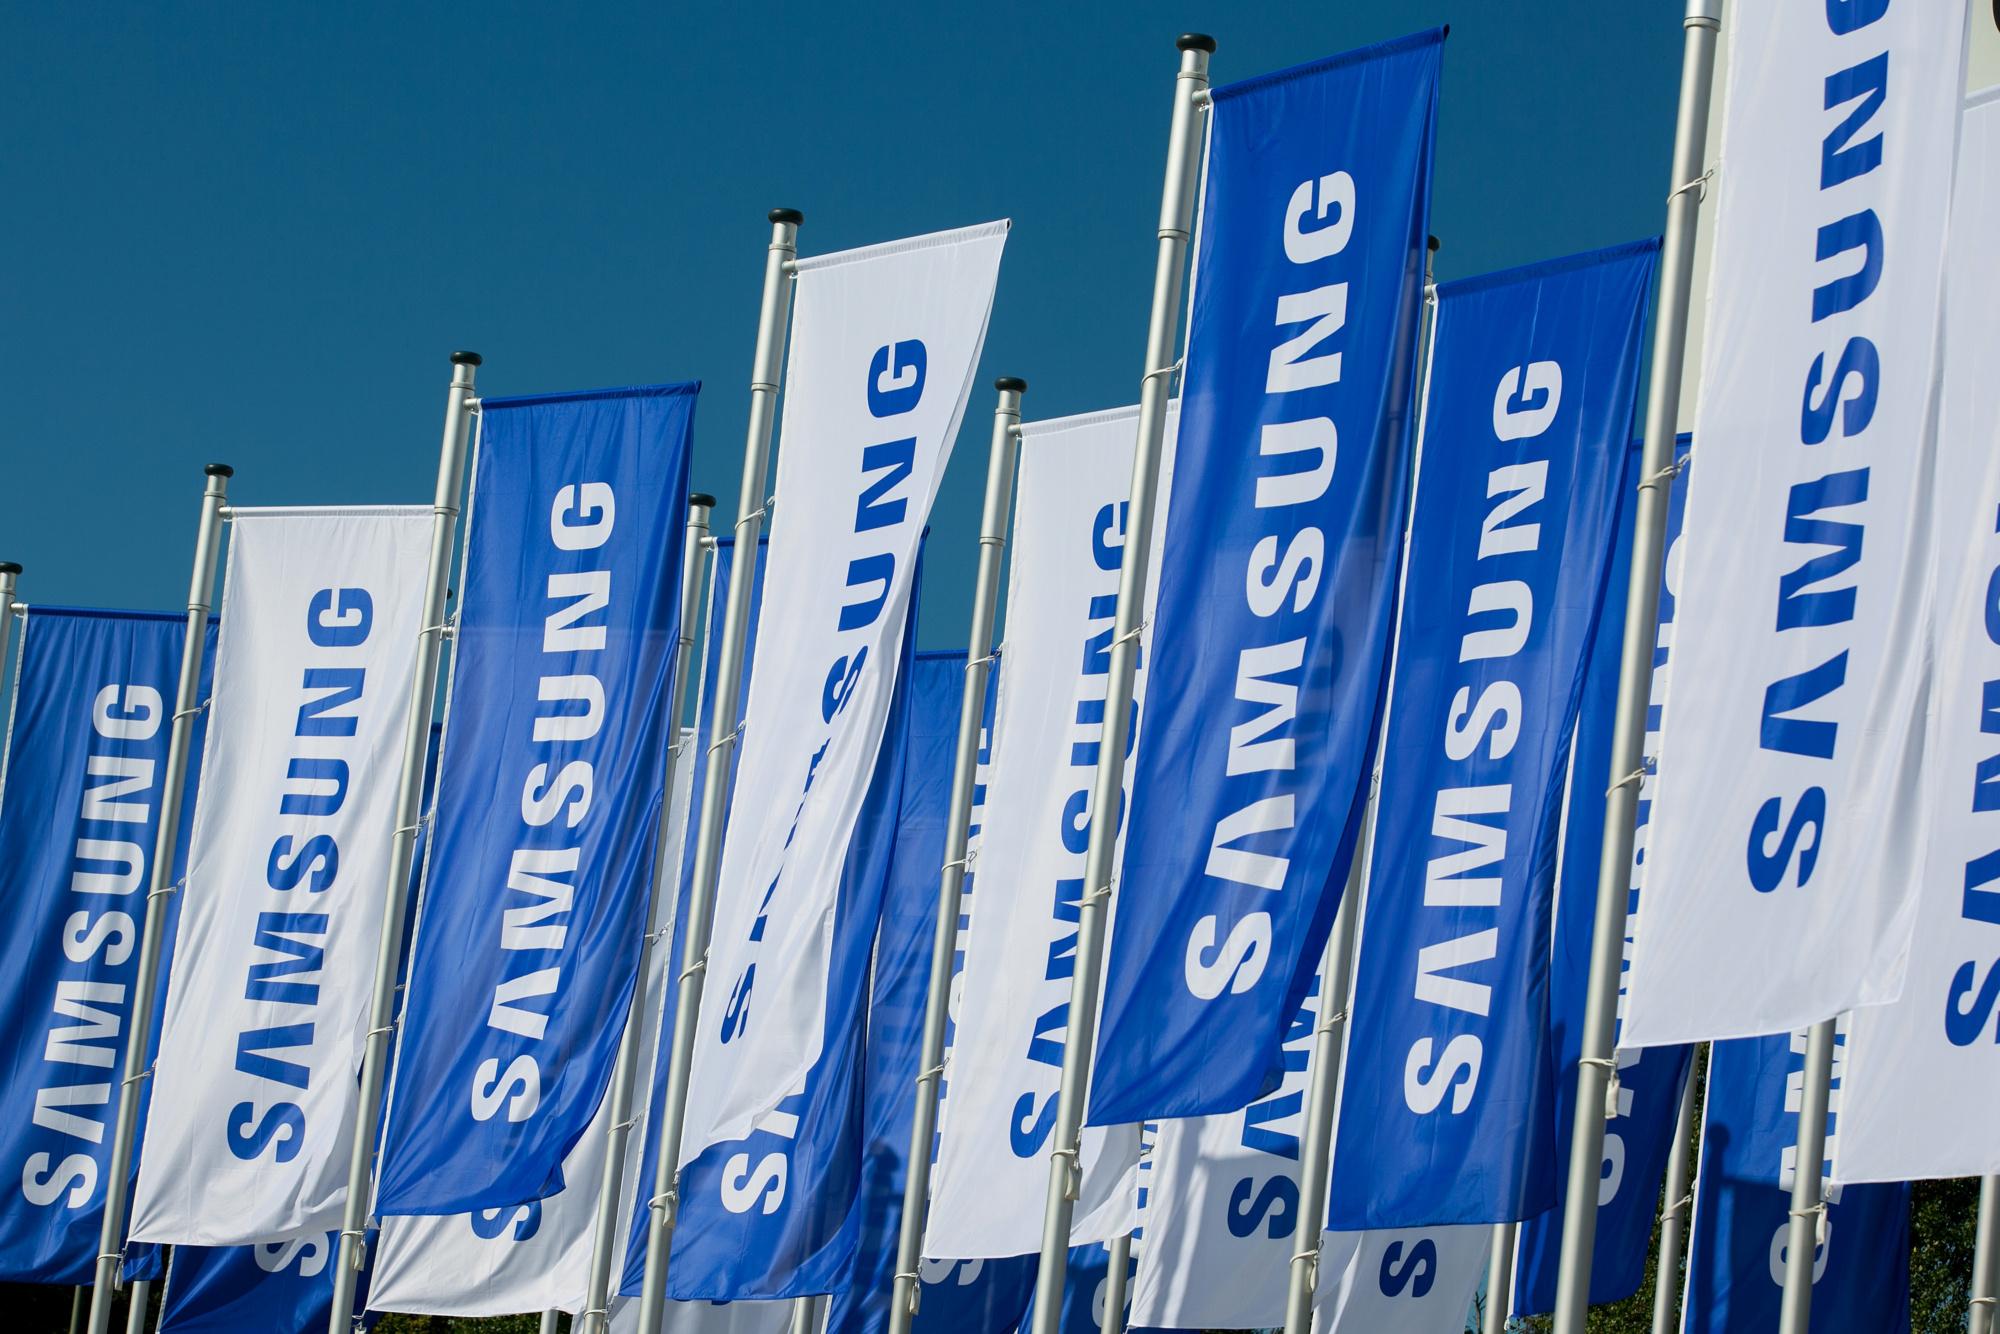 Ssnlfotc Us Stock Quote Samsung Electronics Co Ltd Bloomberg